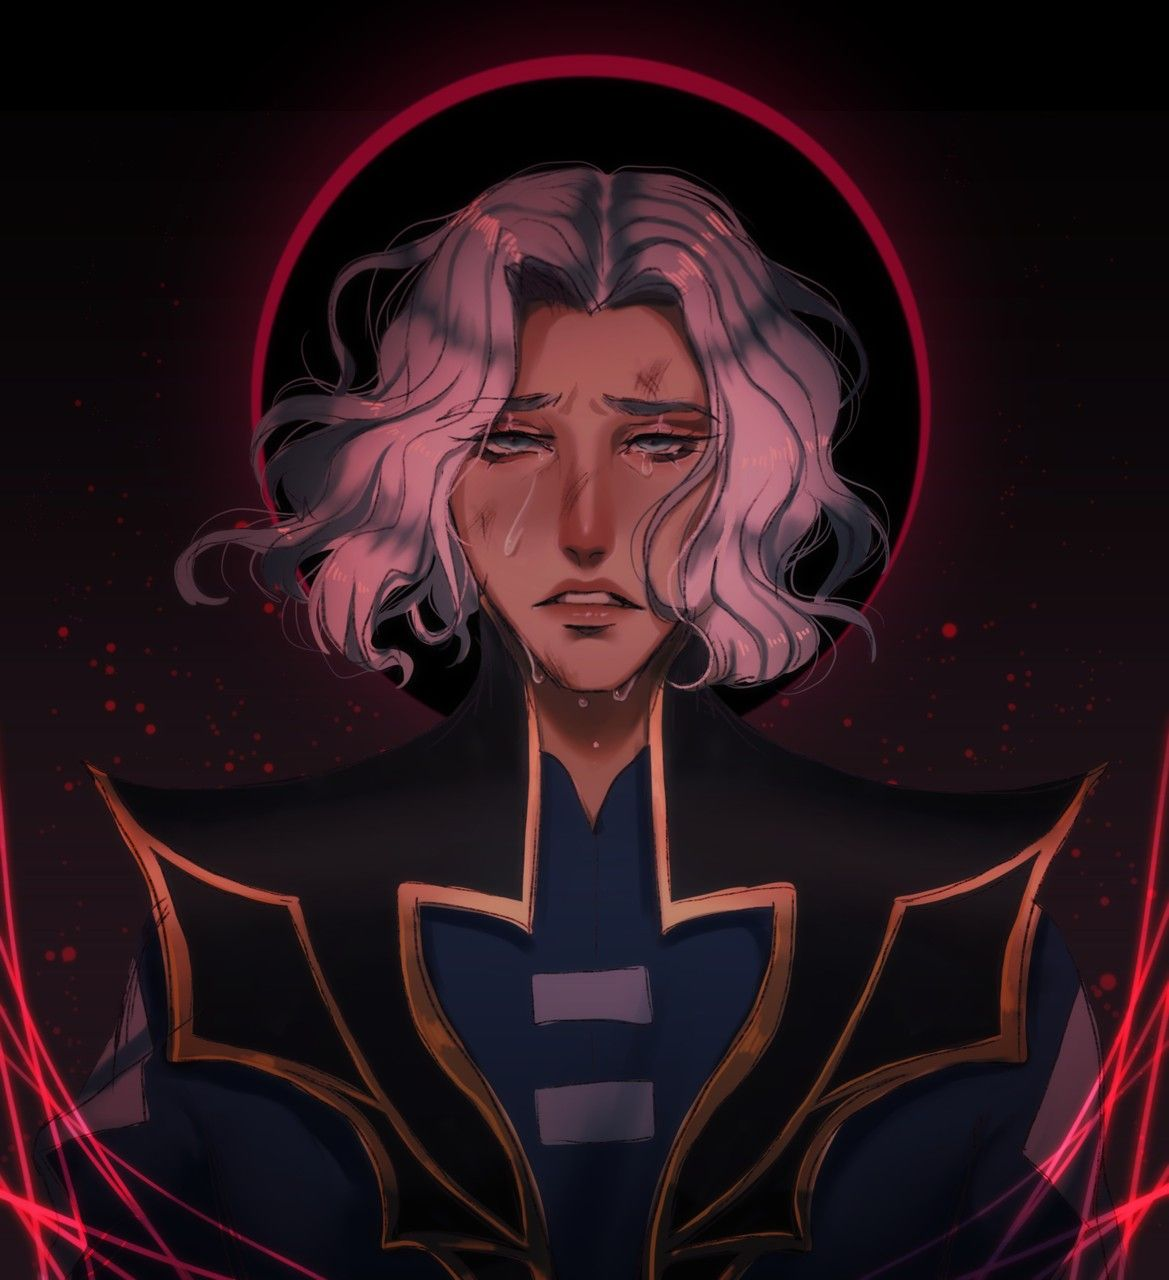 Castlevania Cartoon Anime Game Netflix fanart (With